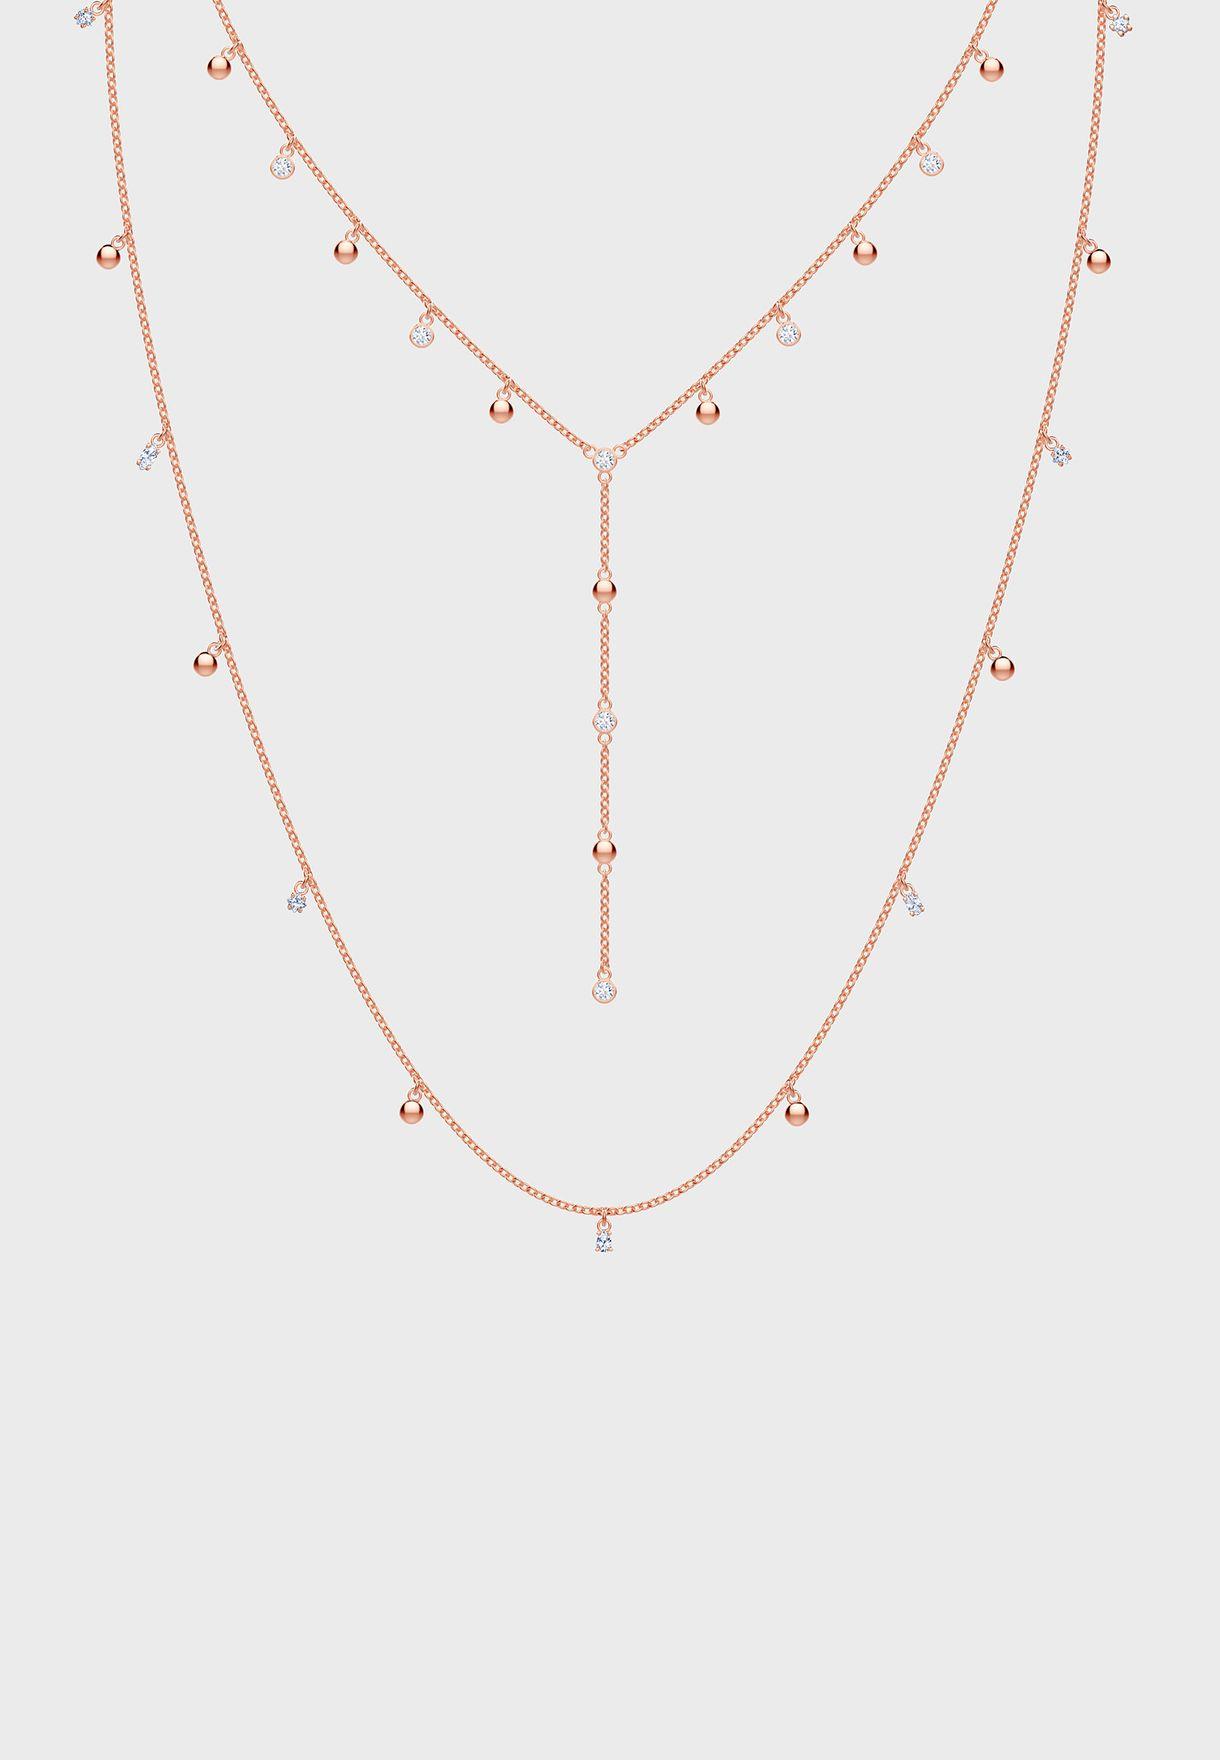 Moonsun Layered Necklace